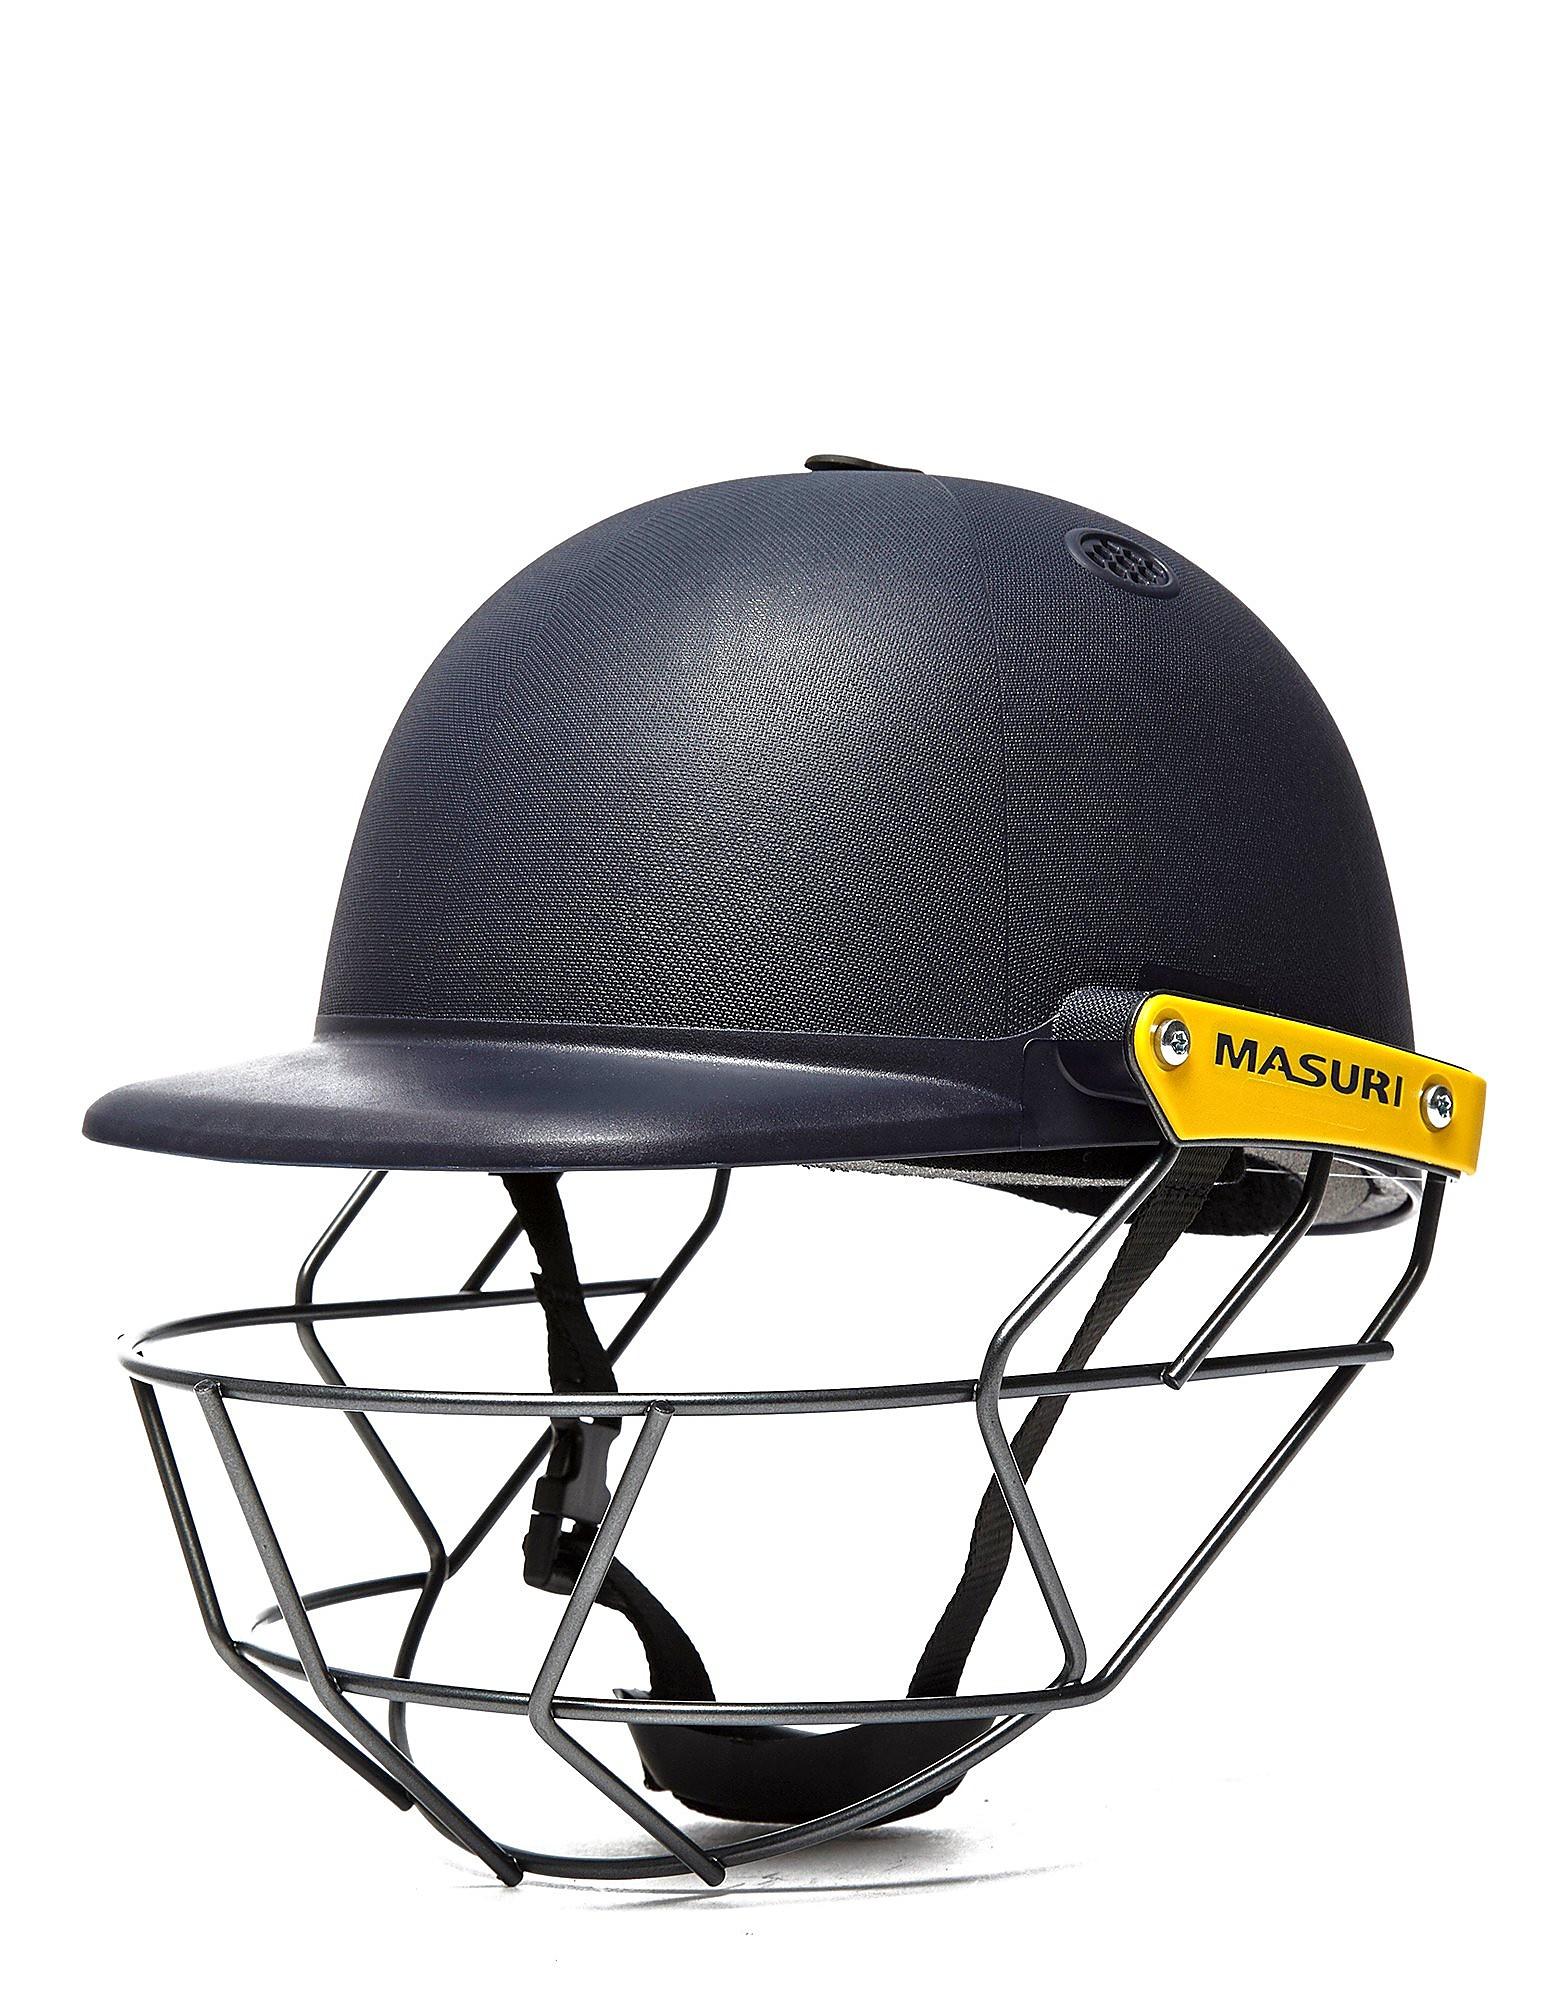 Masuri Original Series Legacy Junior Cricket Helmet